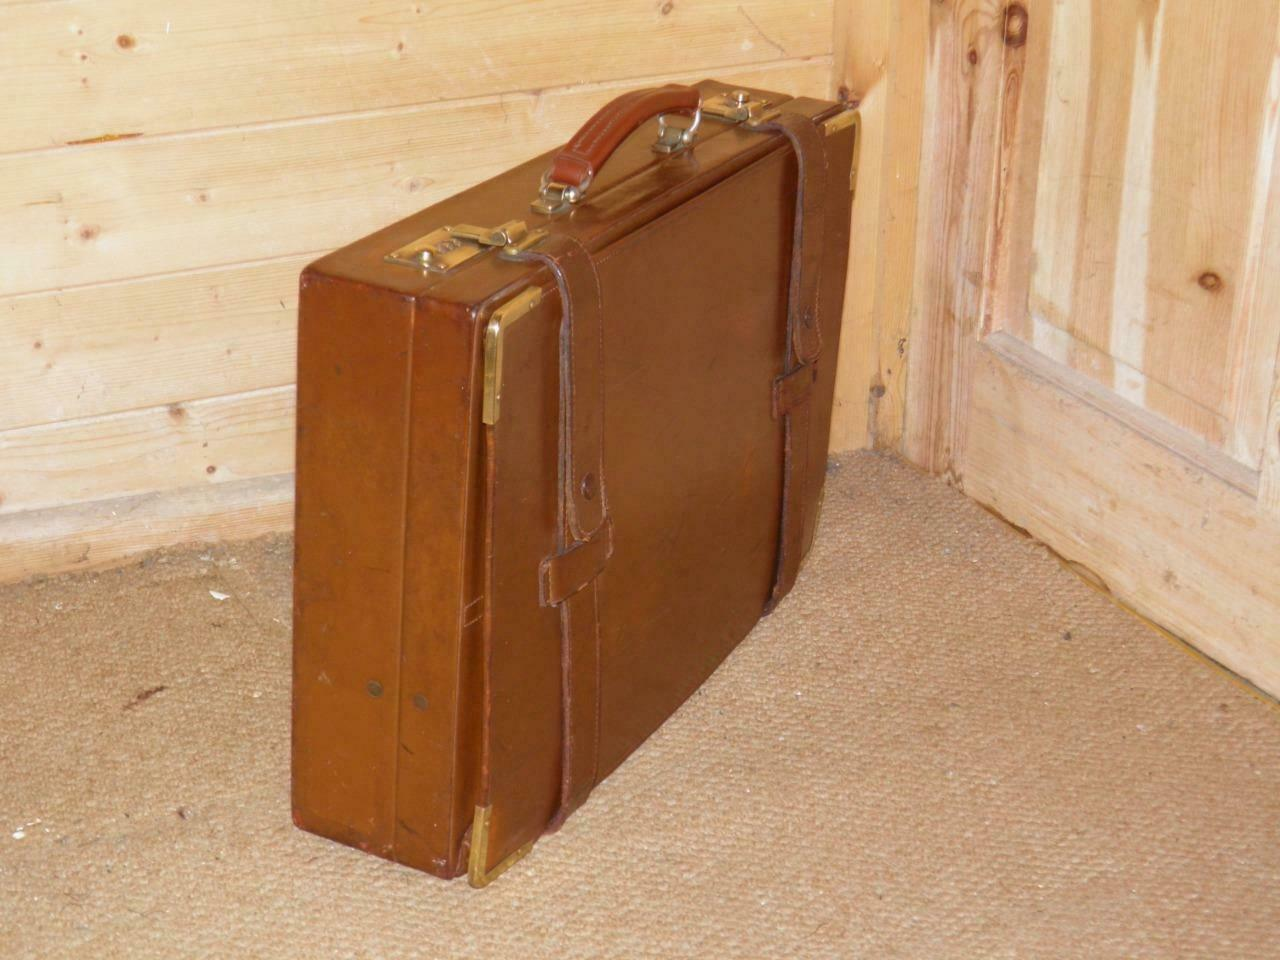 Vintage SWAINE ADENEY BRIGG Brown Leather Briefcase With Metal Combination Locks